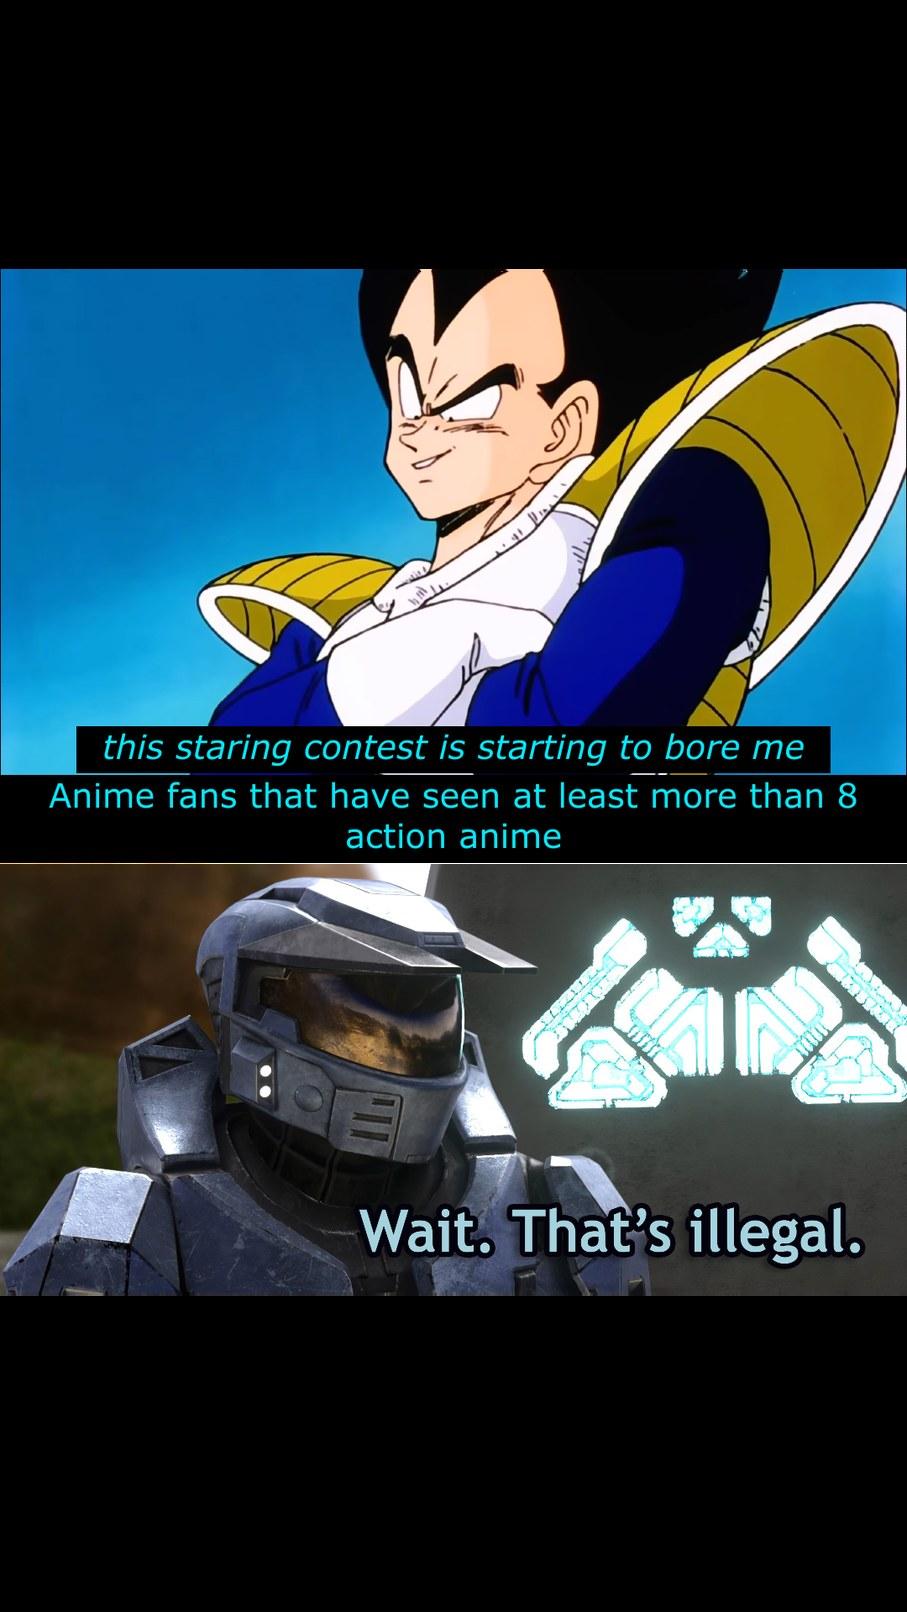 idk if i heard that shit right lmao - meme